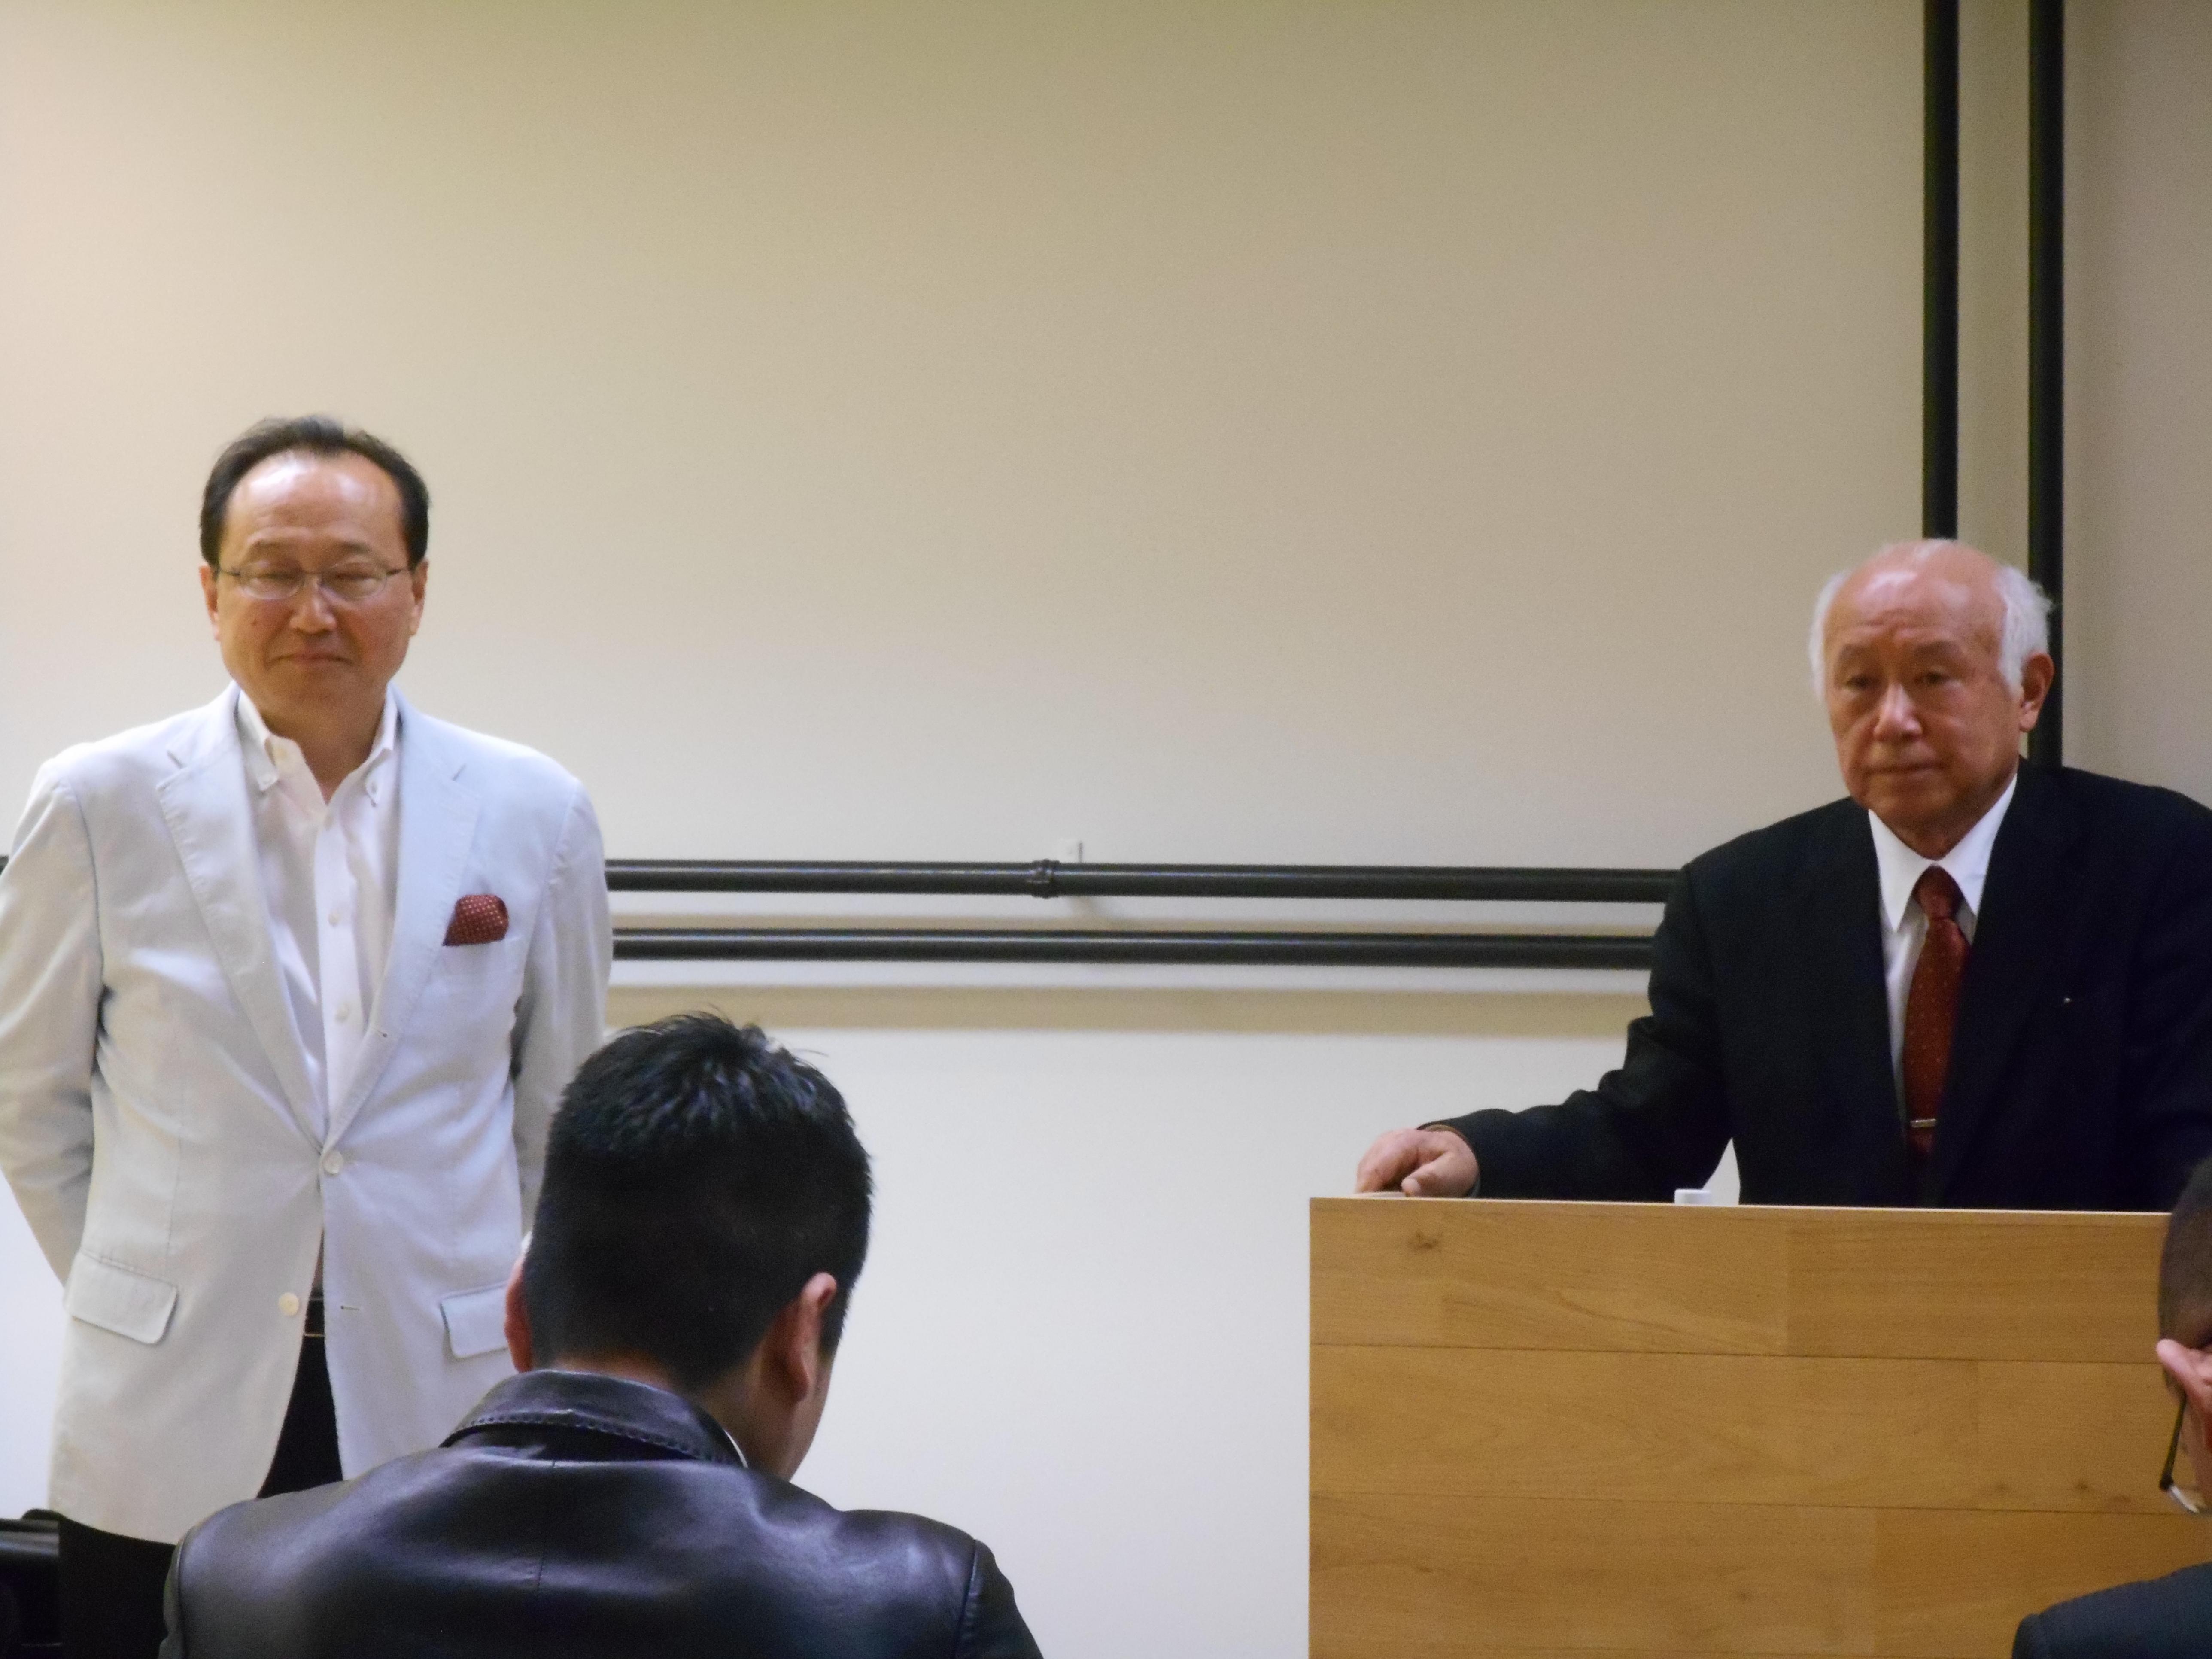 DSCN3731 - 4月1日東京思風塾の開催になります。